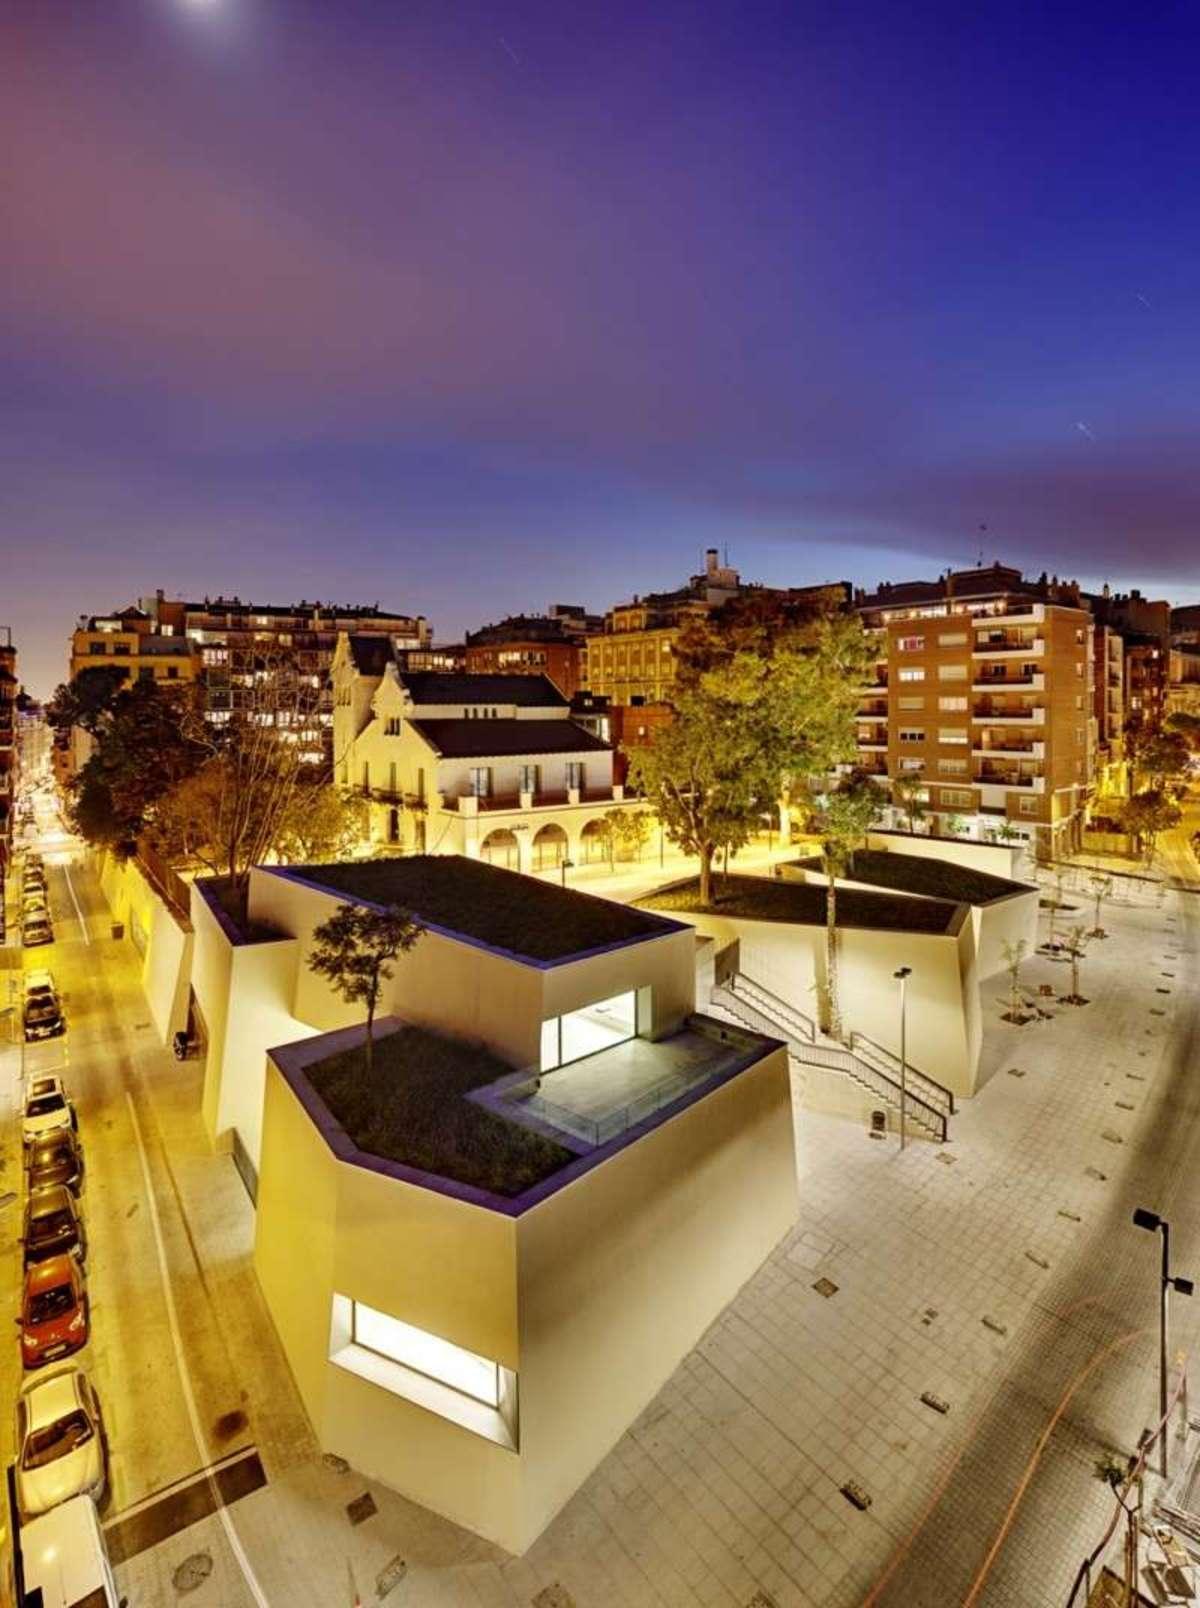 Bcq arquitectura biblioteca joan maragall barcelona - Arquitectura barcelona ...